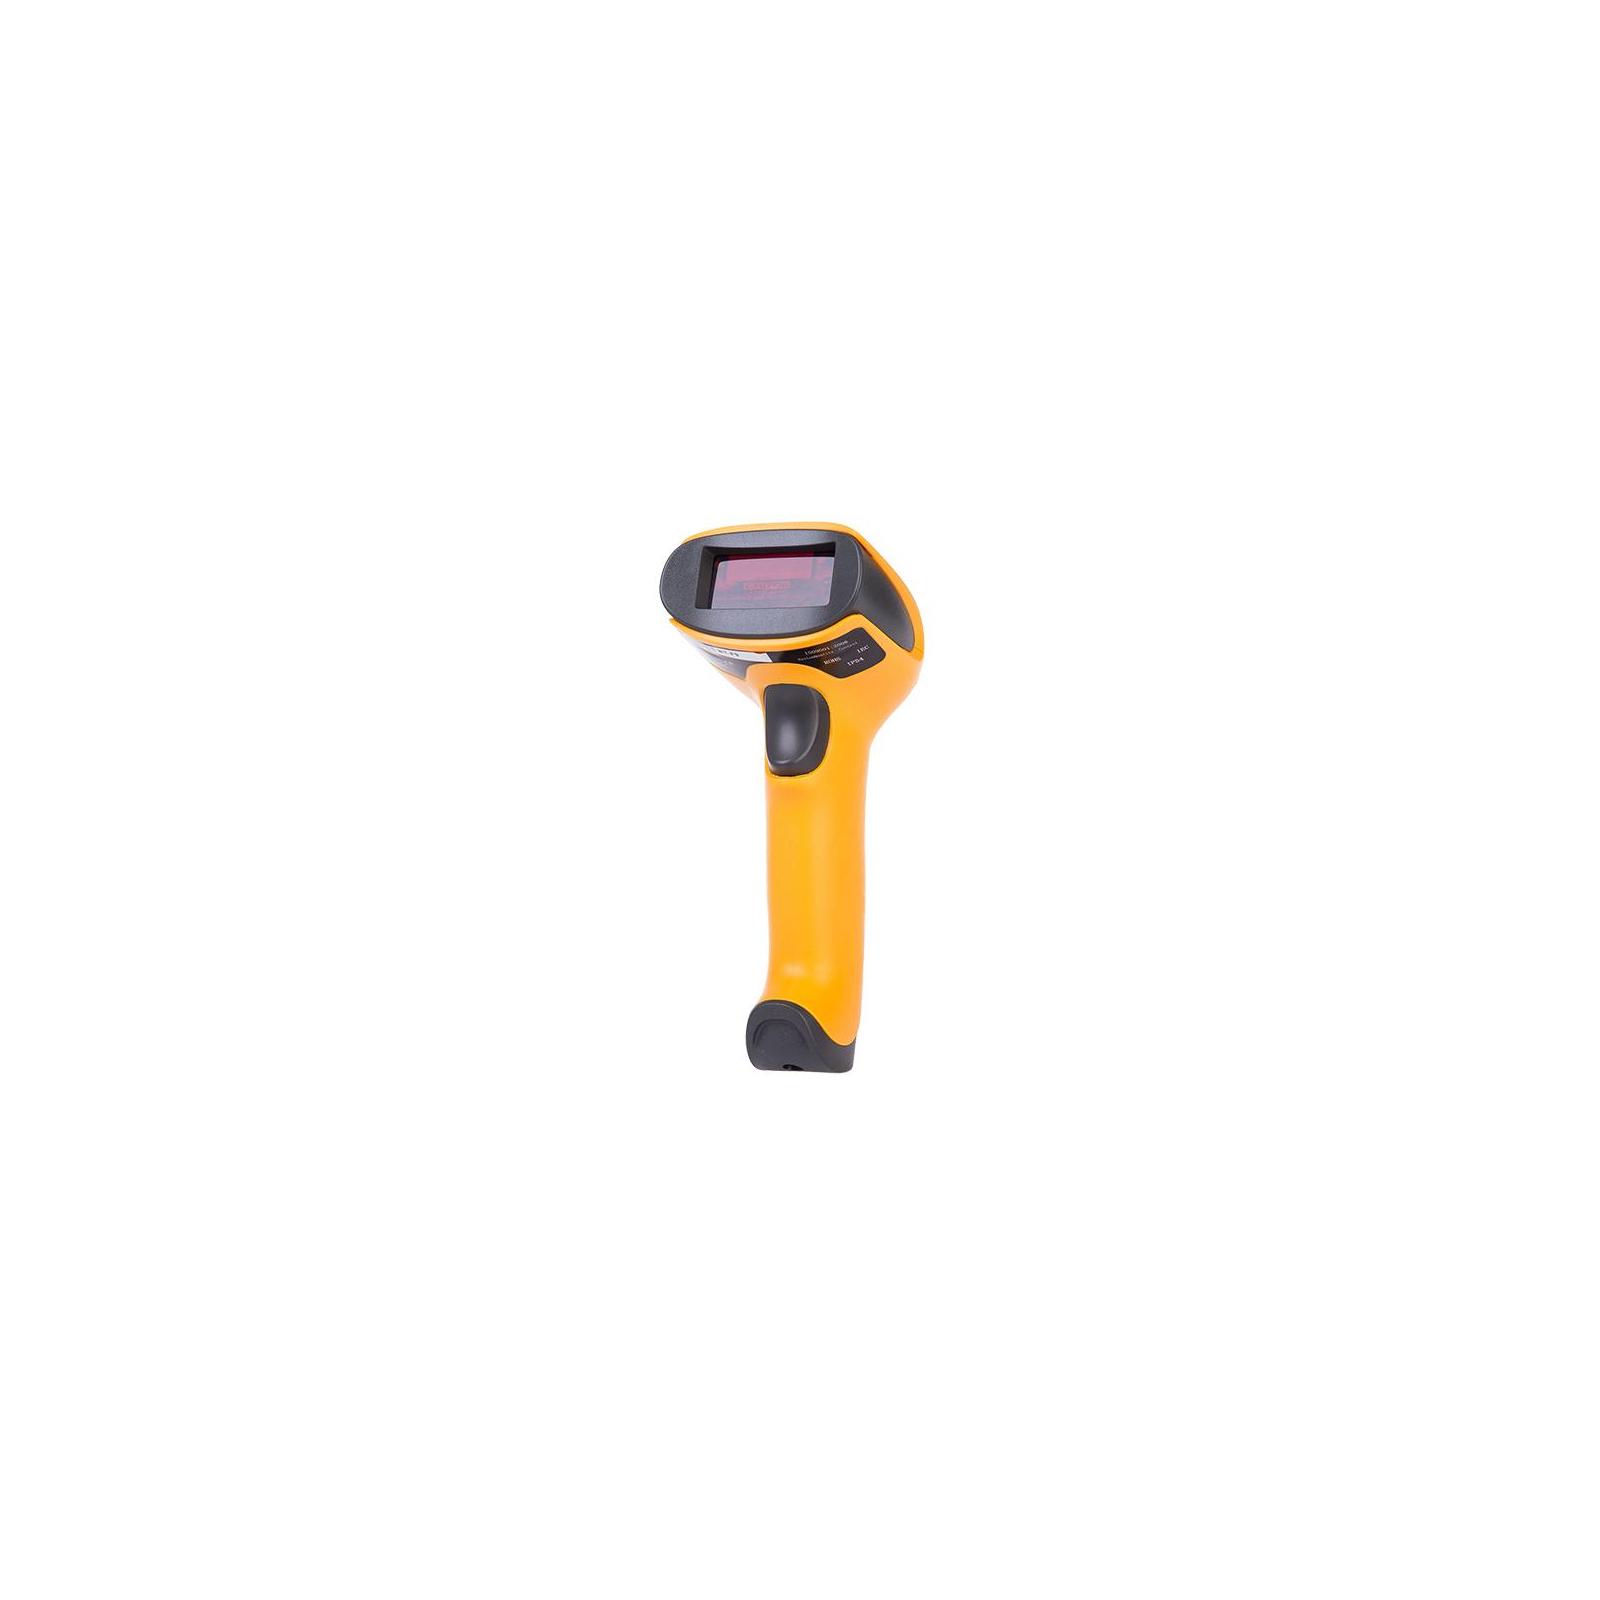 Сканер штрих-кода Netum NT-2028 беспроводной (NT2028W)